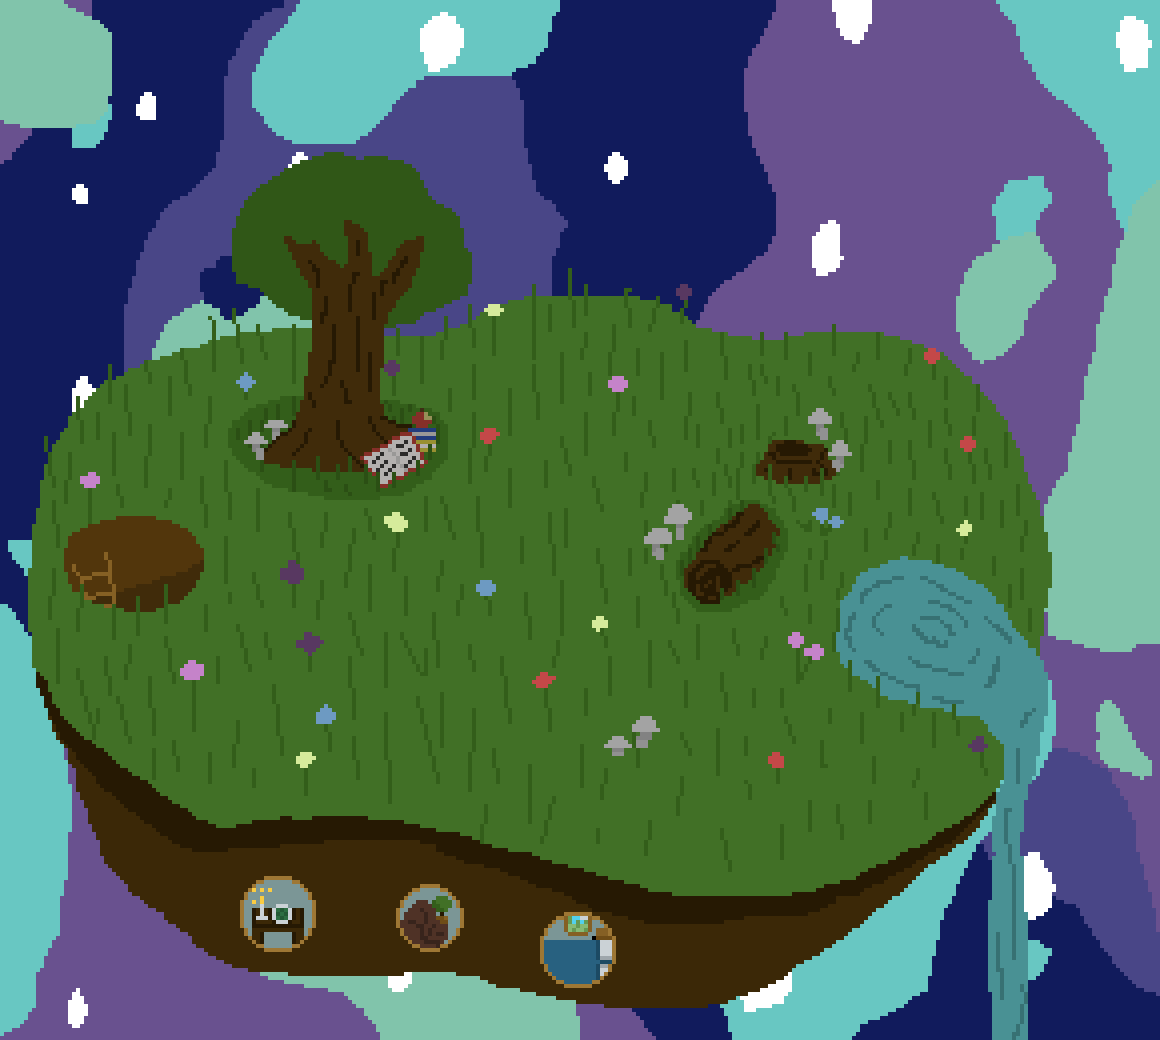 Island home by Pixil-Potato